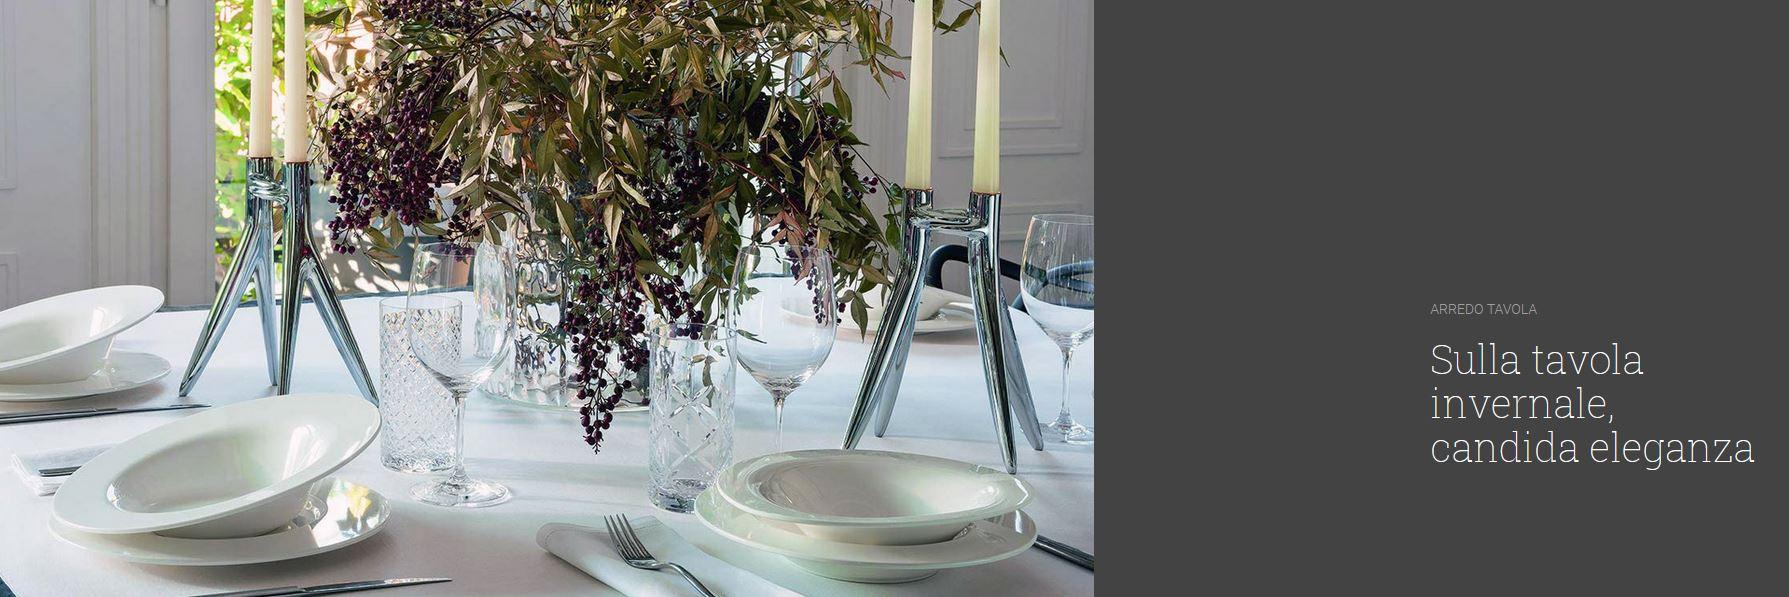 Sulla tavola invernale candida eleganza